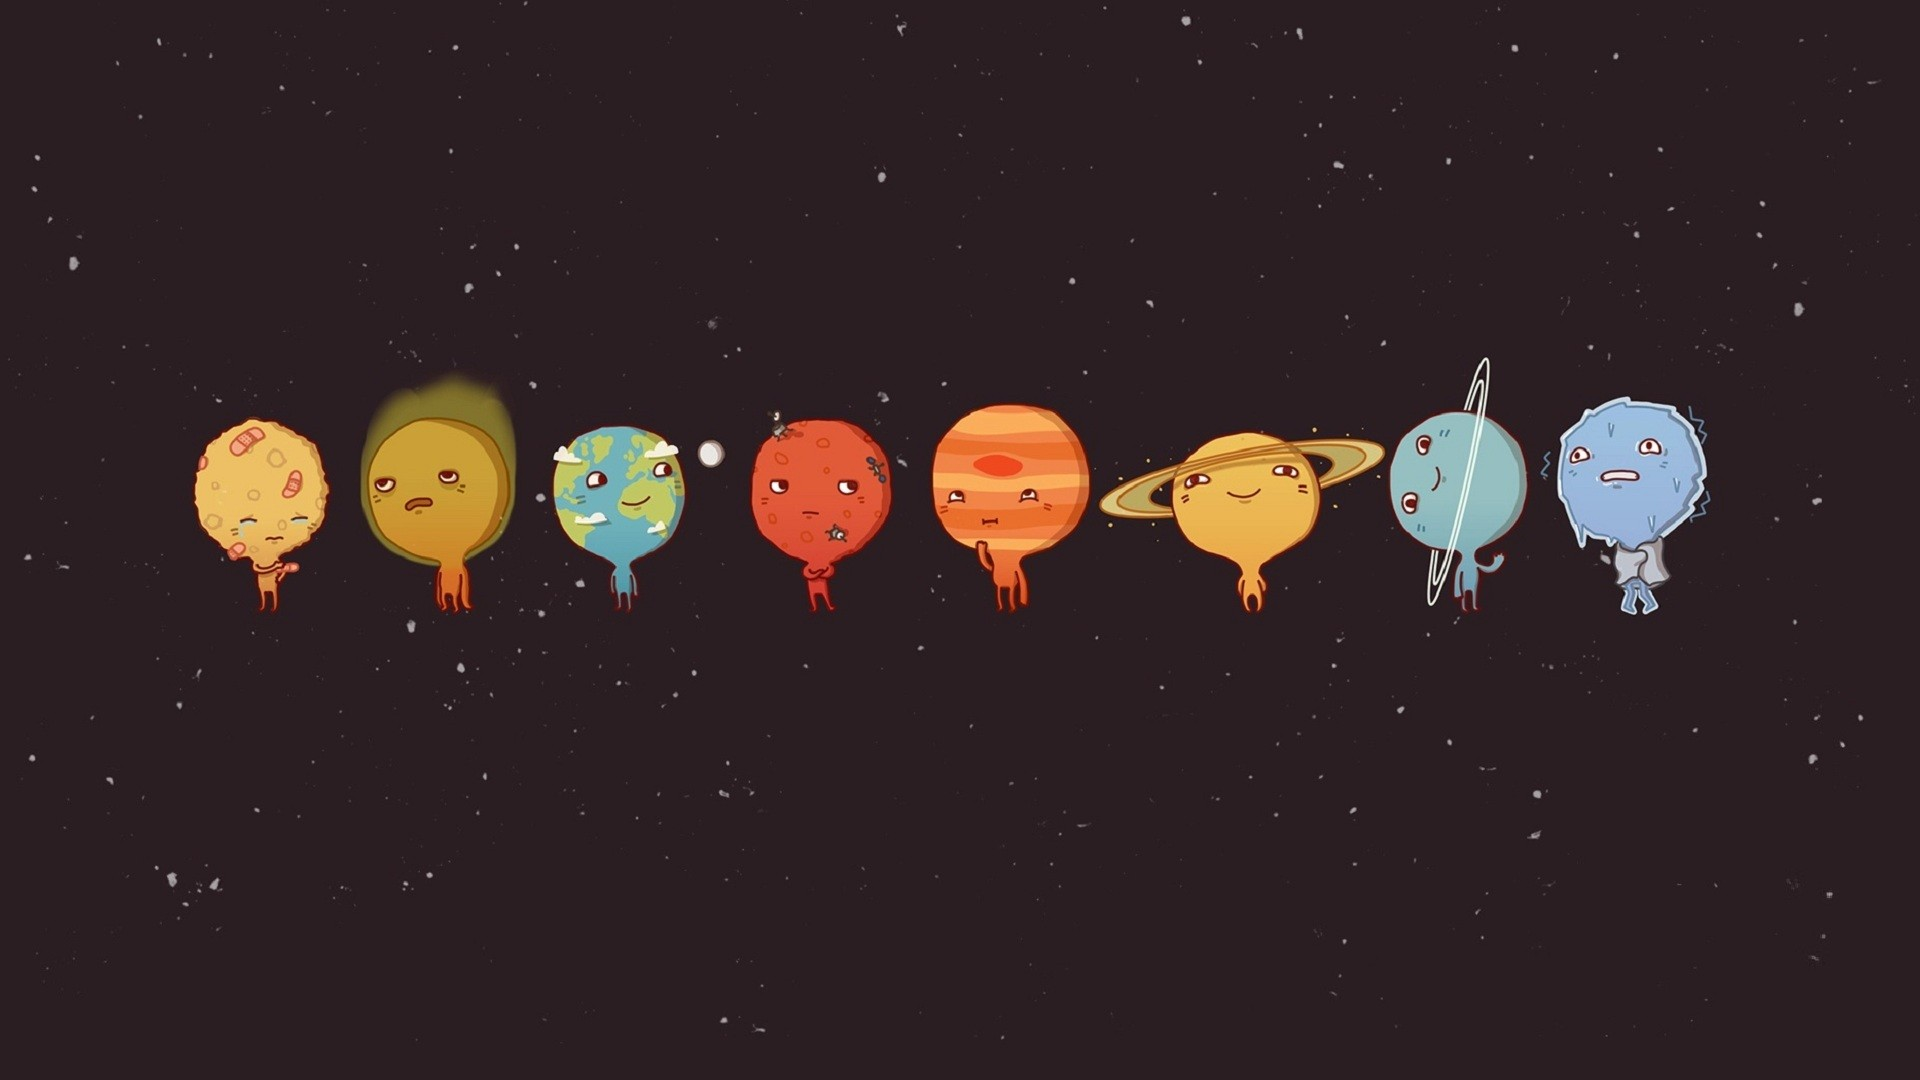 General-1920x1080-space-Sun-Pluto-Venus-Mercury-Earth-Mars-moon-Solar-System-minimalism-wallpaper-wp3406196